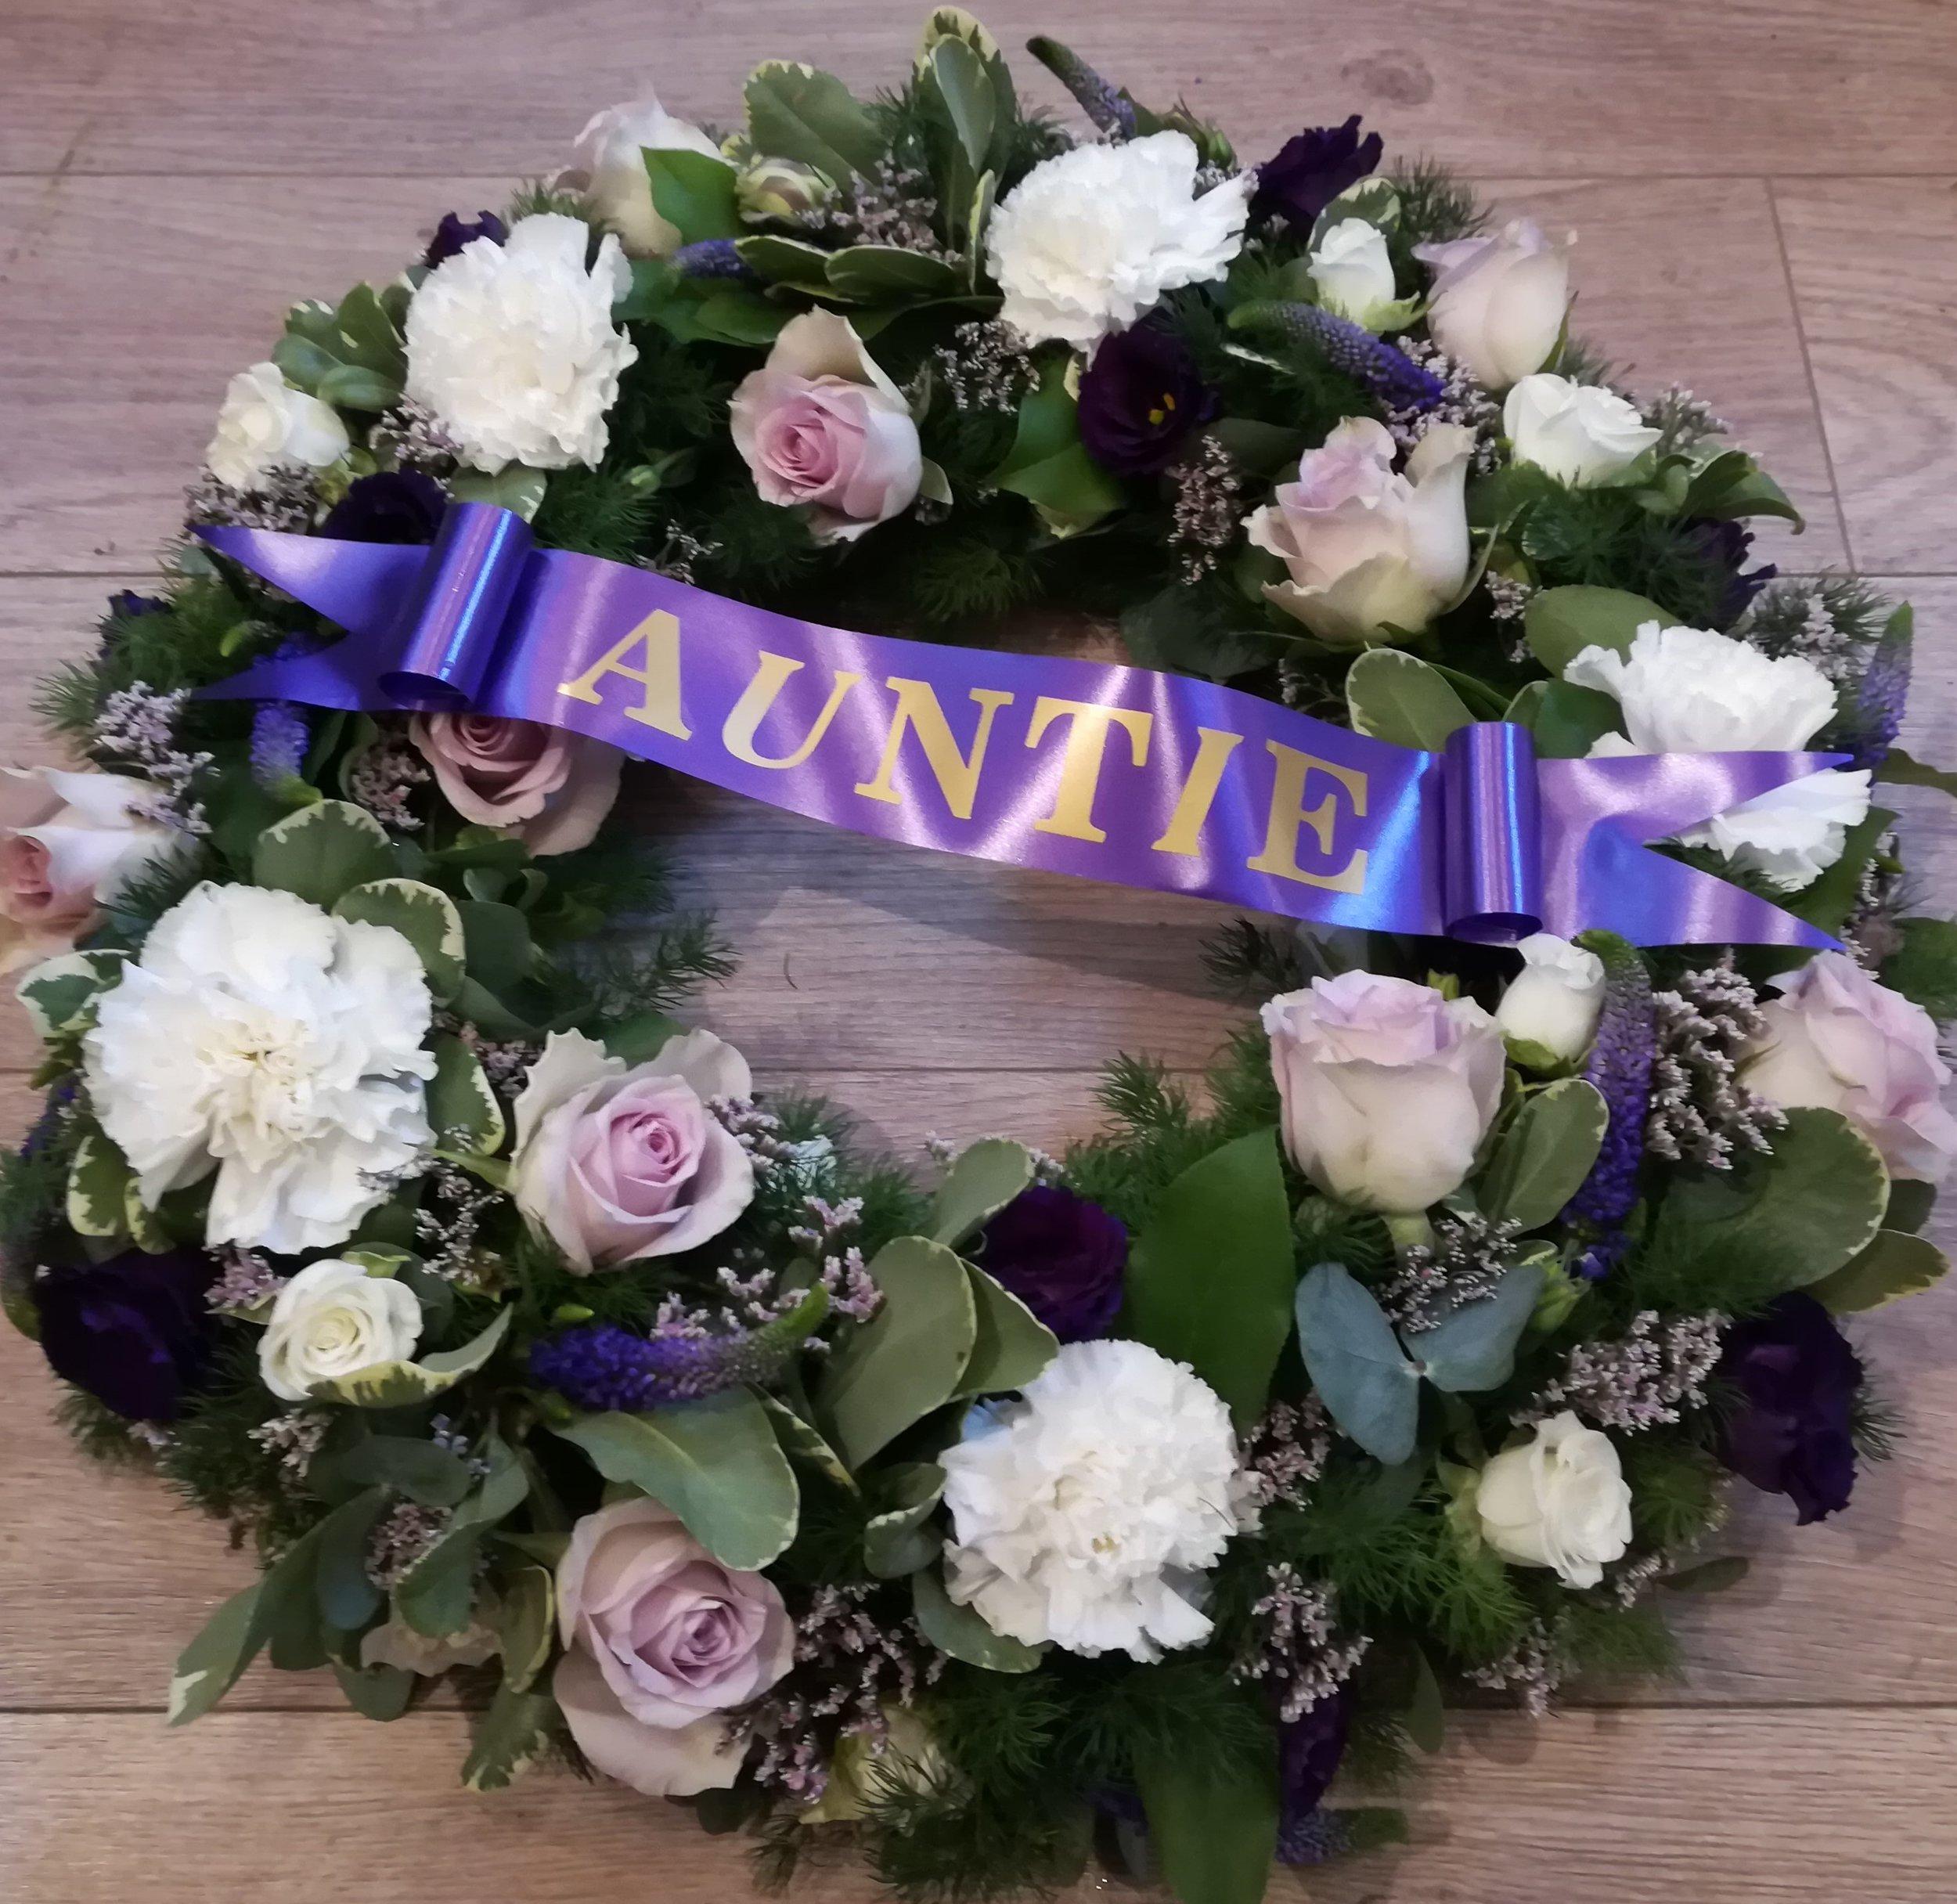 Purple and White Wreath - Auntie.jpg